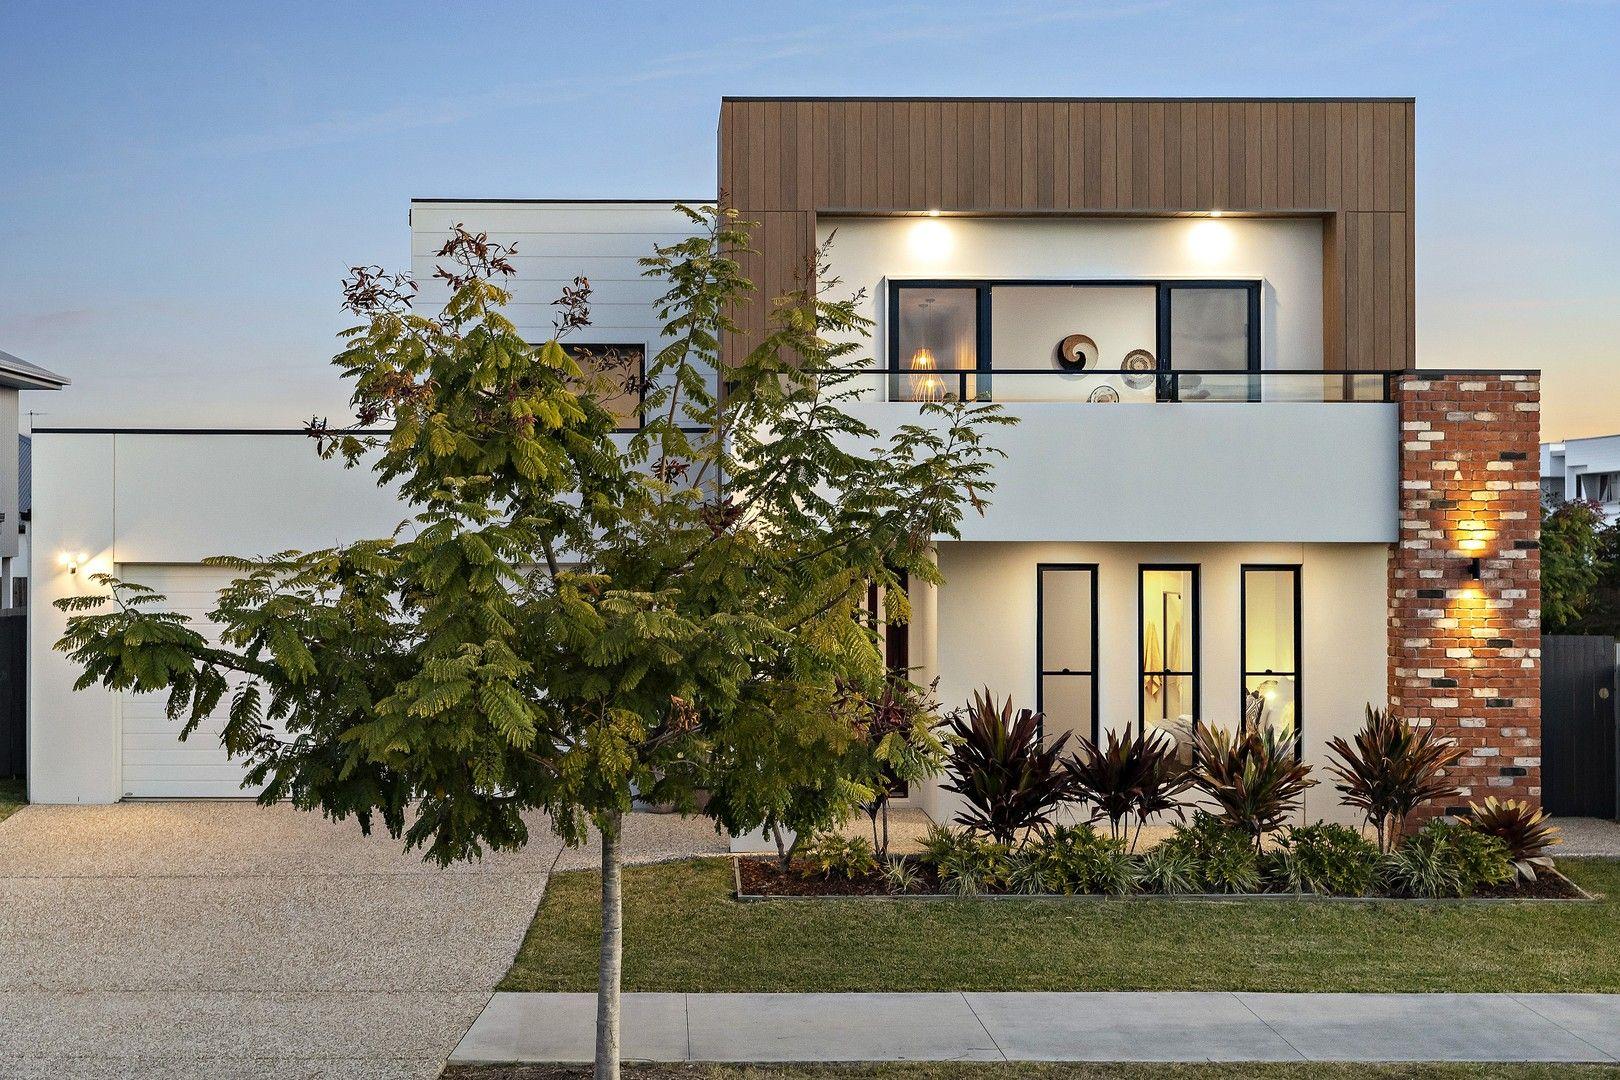 97 Lakeview  Promenade, Newport QLD 4020, Image 0